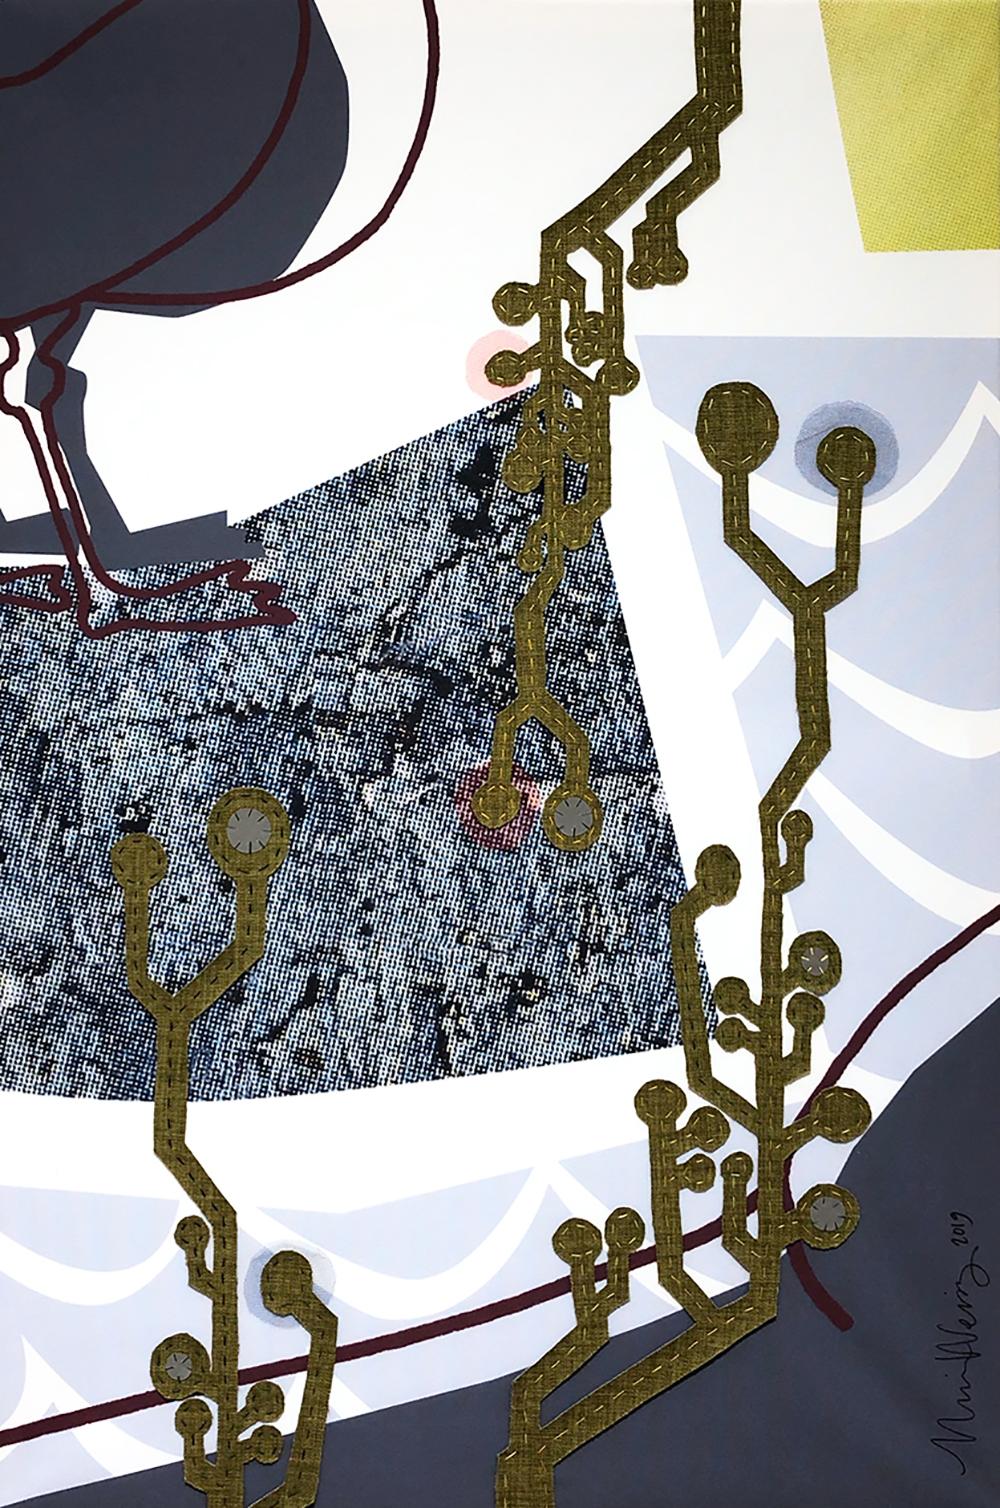 Ulrika Weinz Textil   Collage, fungerar utmärkt som ljudabsorbent 80 x 120 cm, uppspänd på 4 cm djup kilram 11 500 kr weinzatwork.com